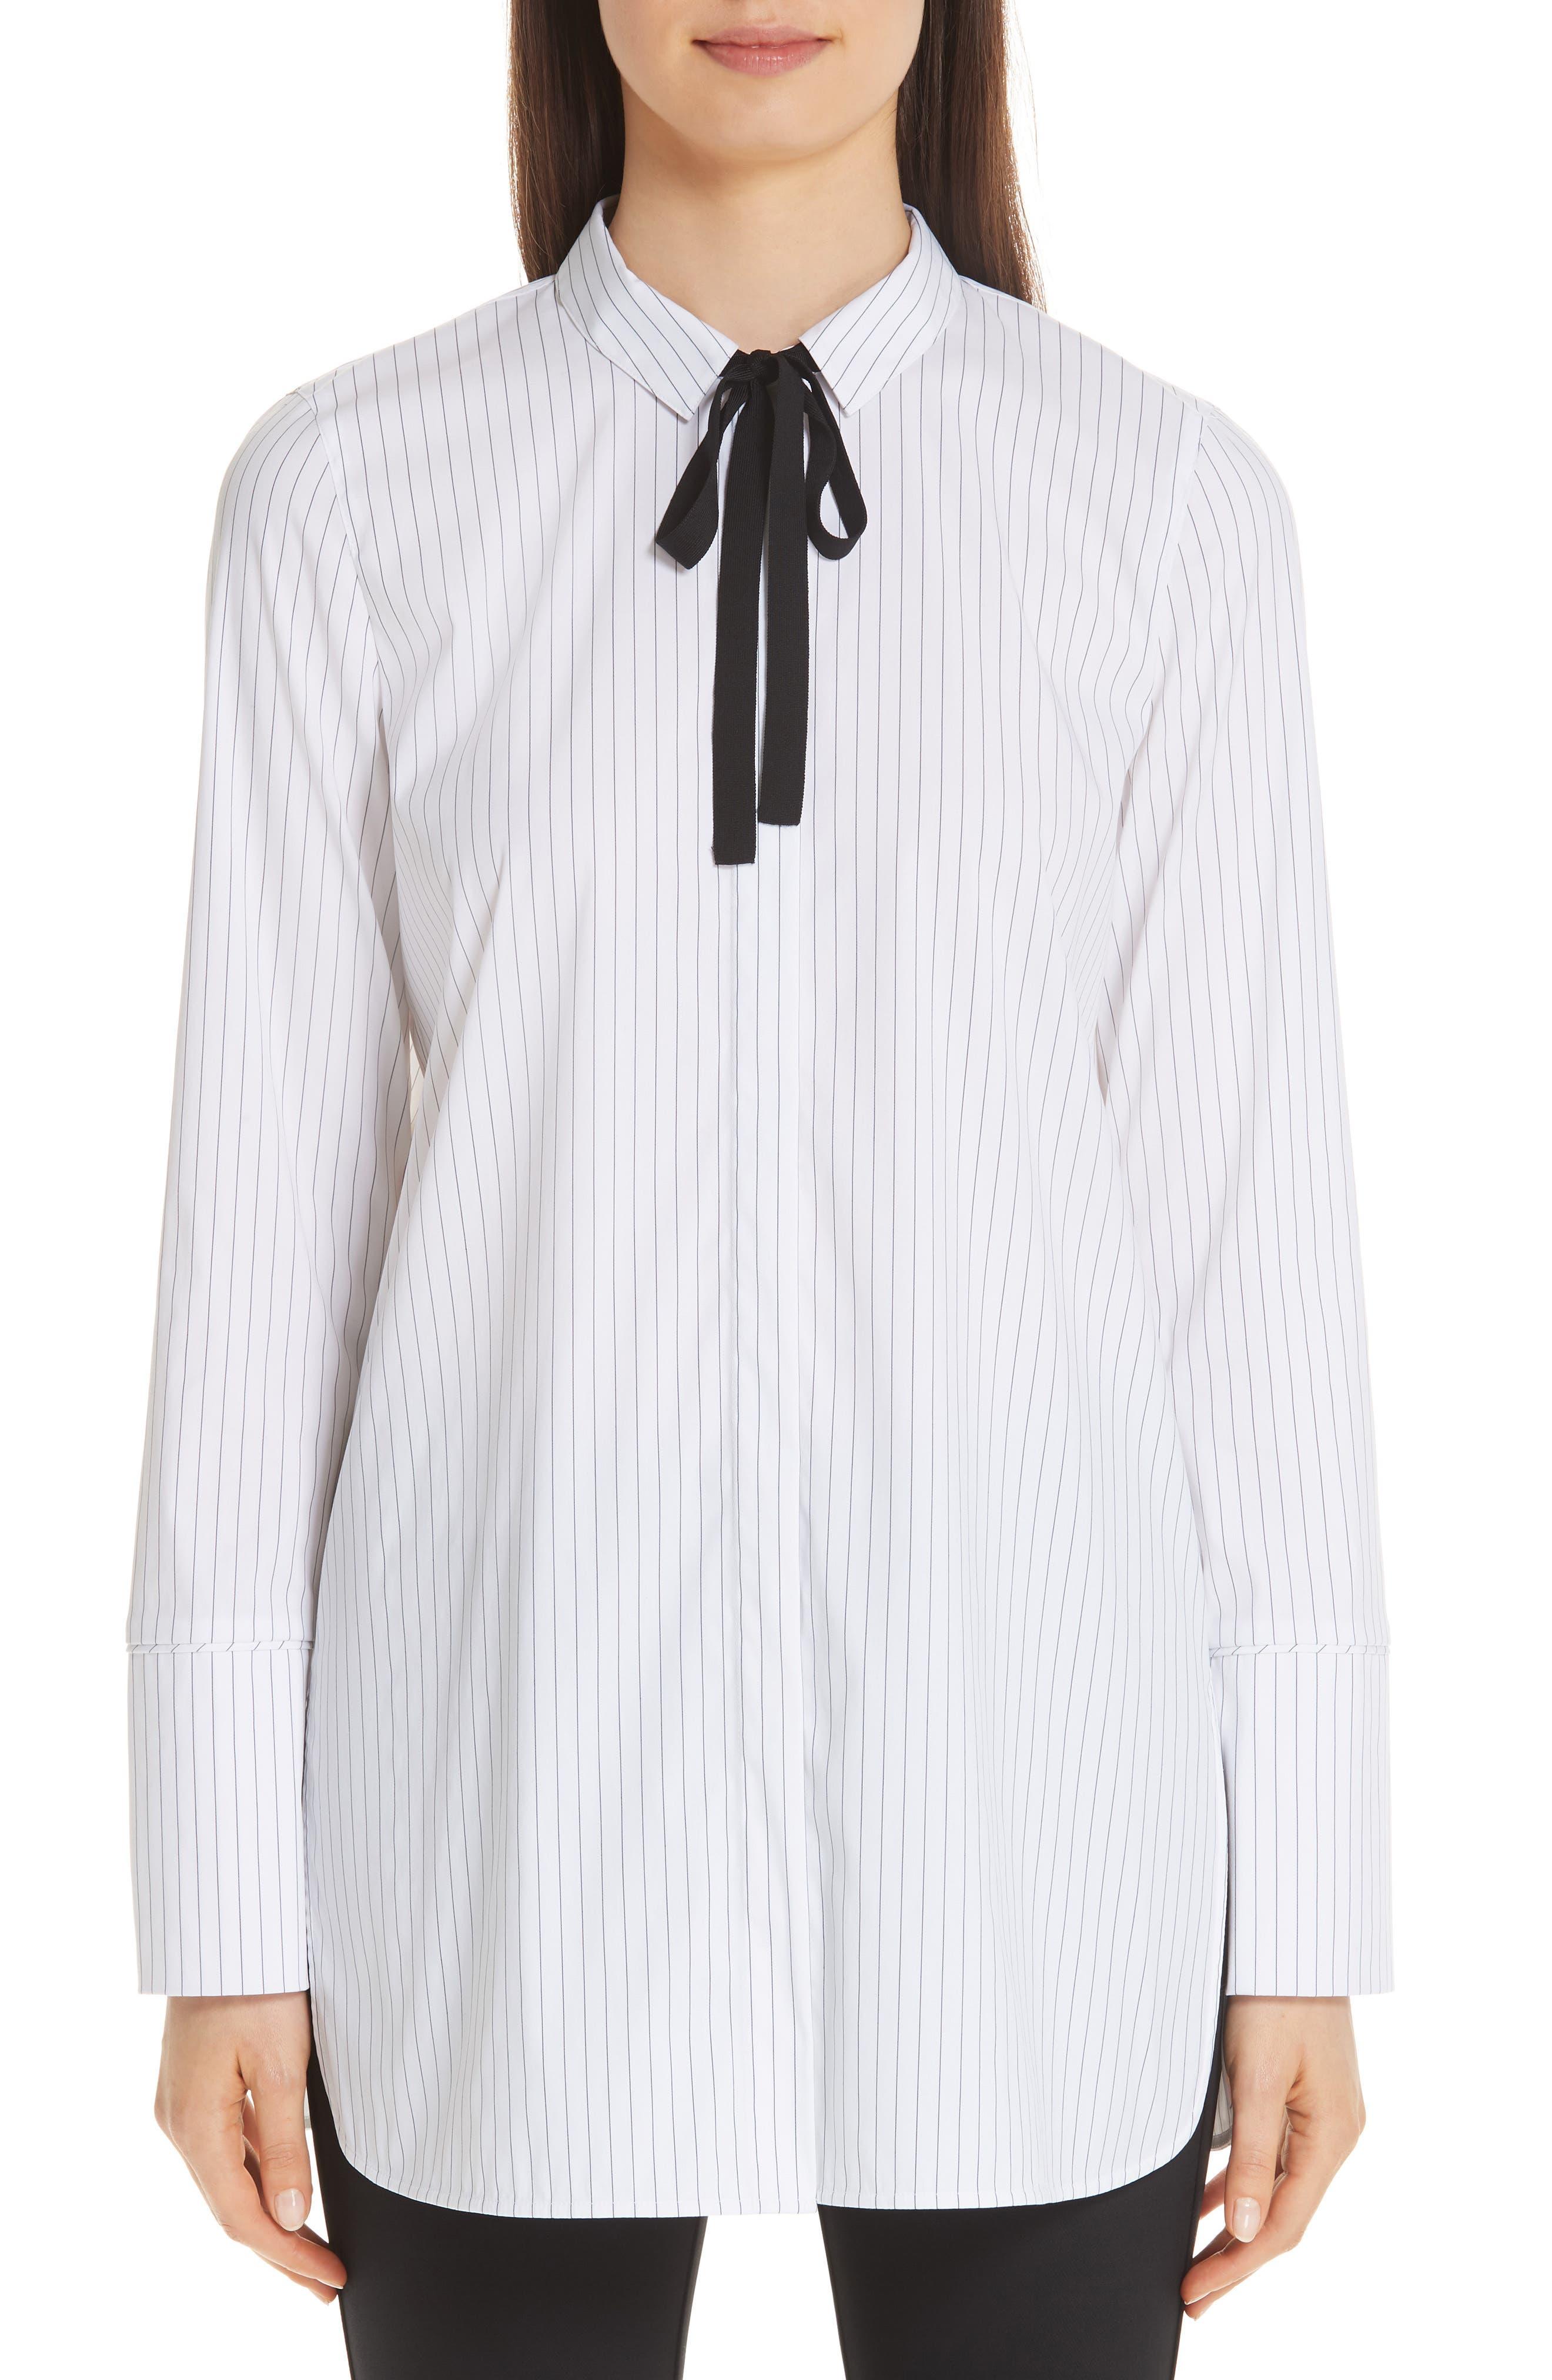 Annaleise Contrast Tie Stanford Stripe Blouse,                             Alternate thumbnail 4, color,                             BLACK MULTI